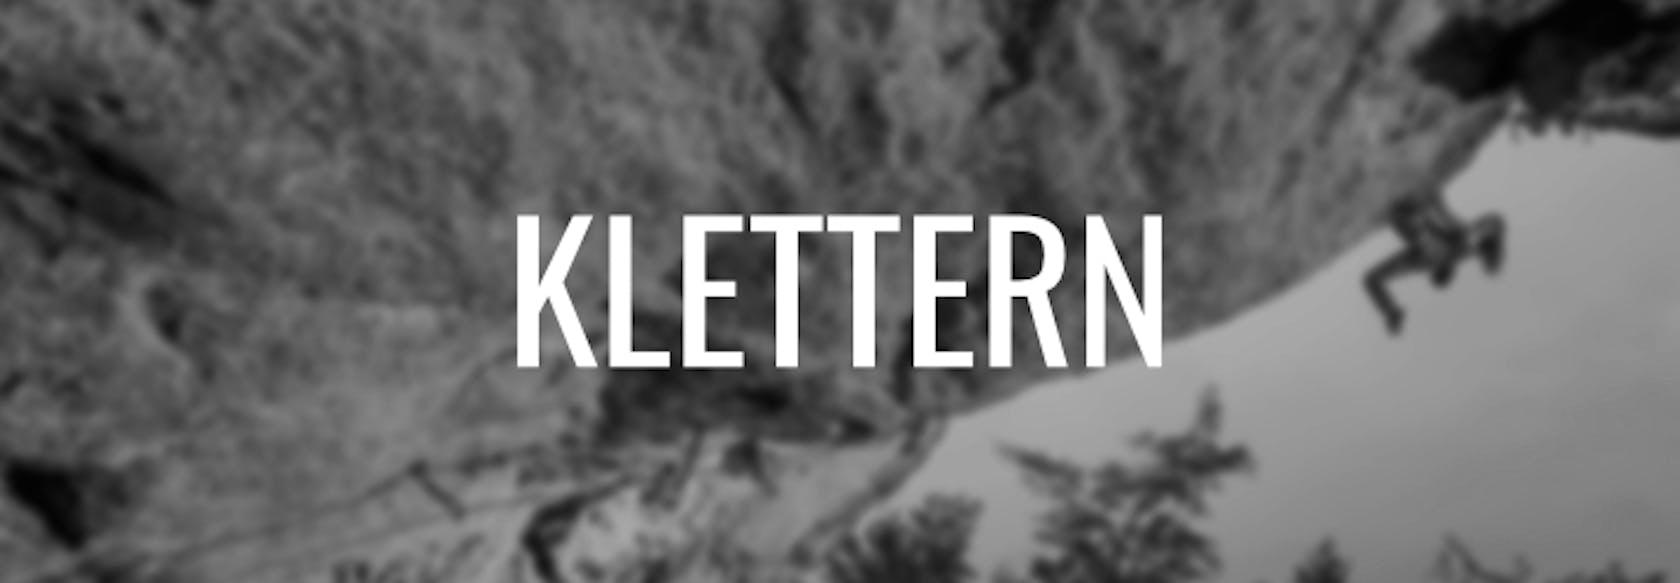 Onlineshop Klettern